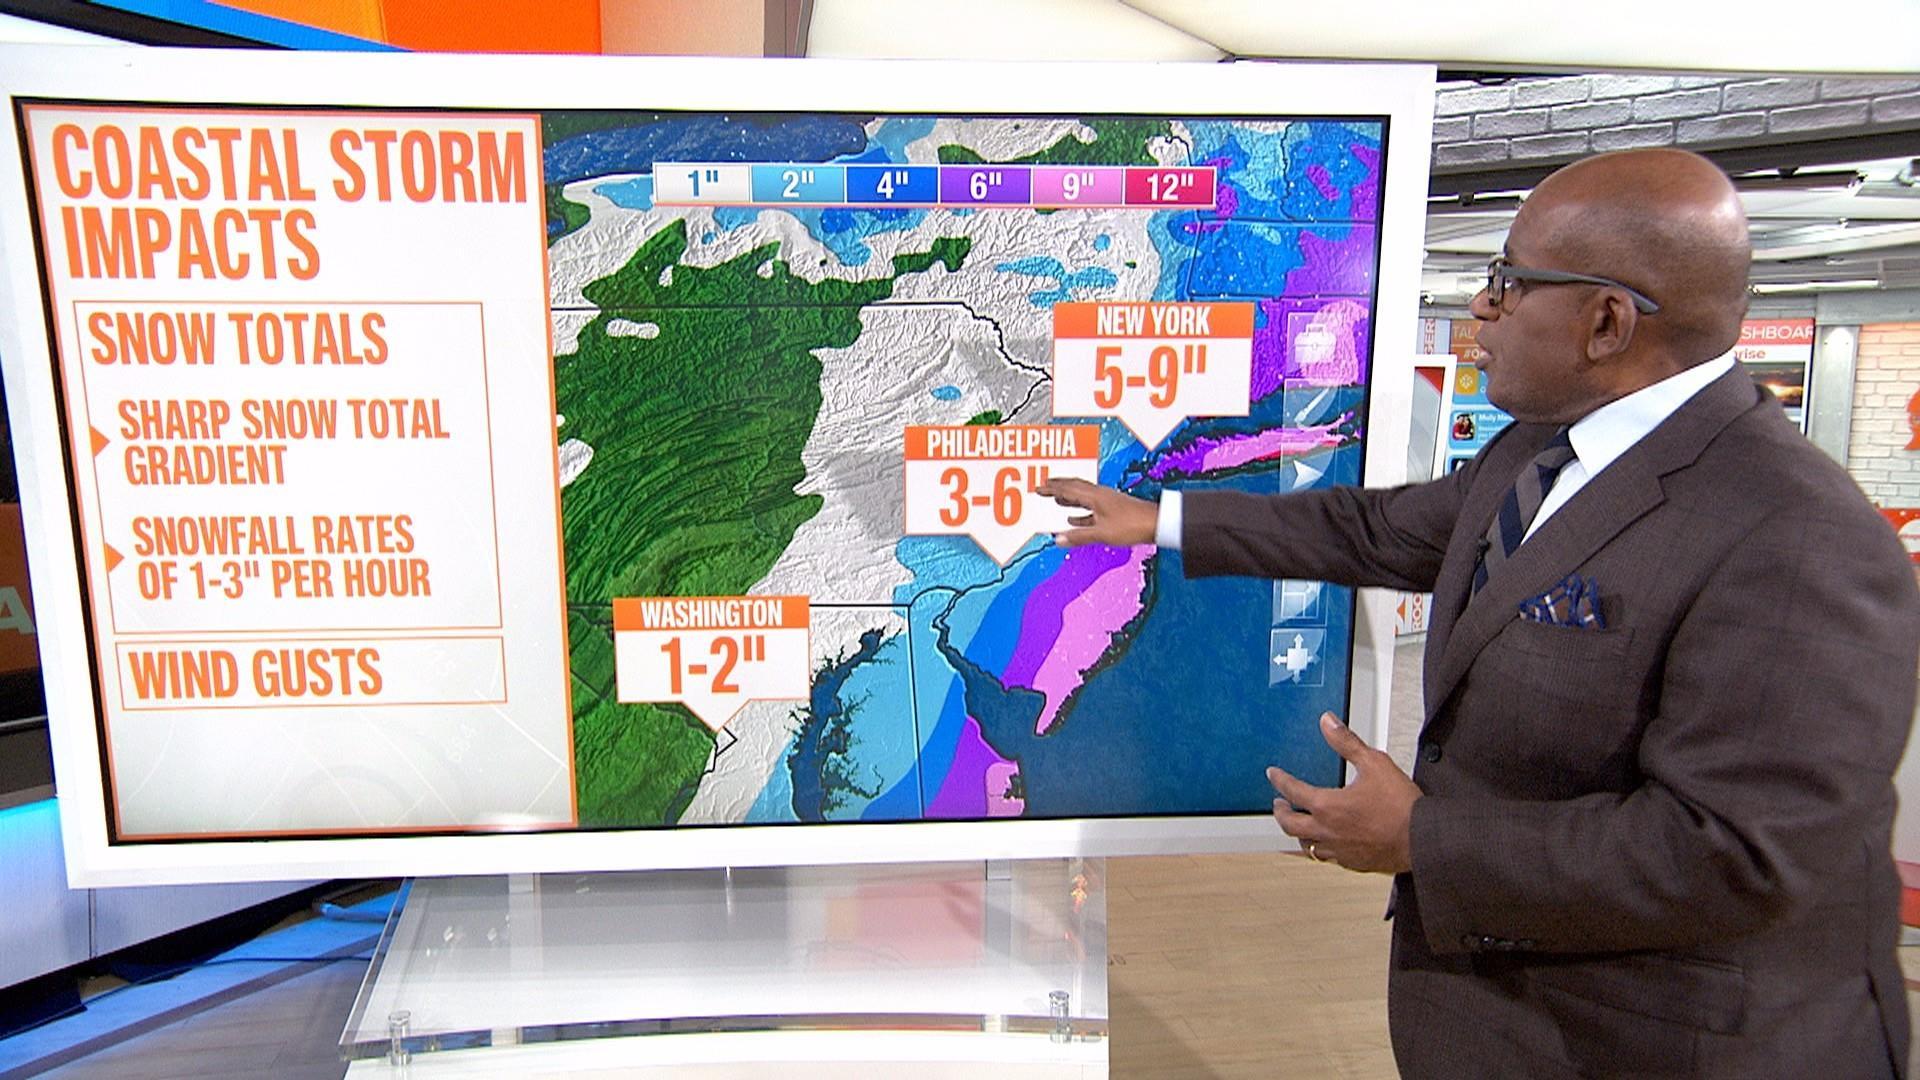 Massive winter storm targets entire East Coast - NBC News